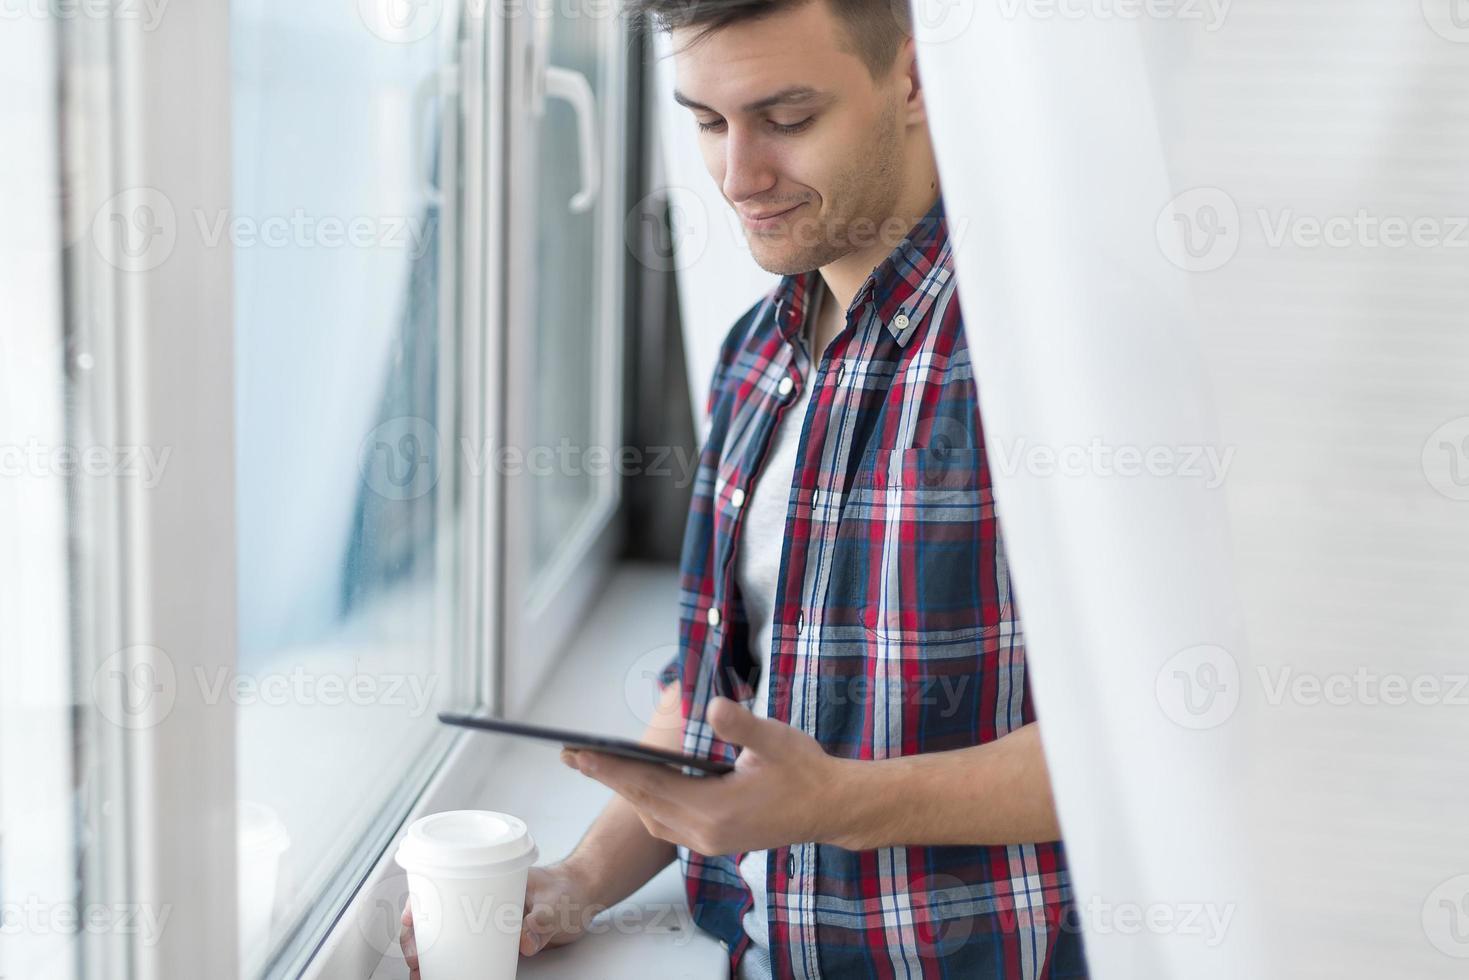 bonitão sorridente homem camisa xadrez perto da janela com foto